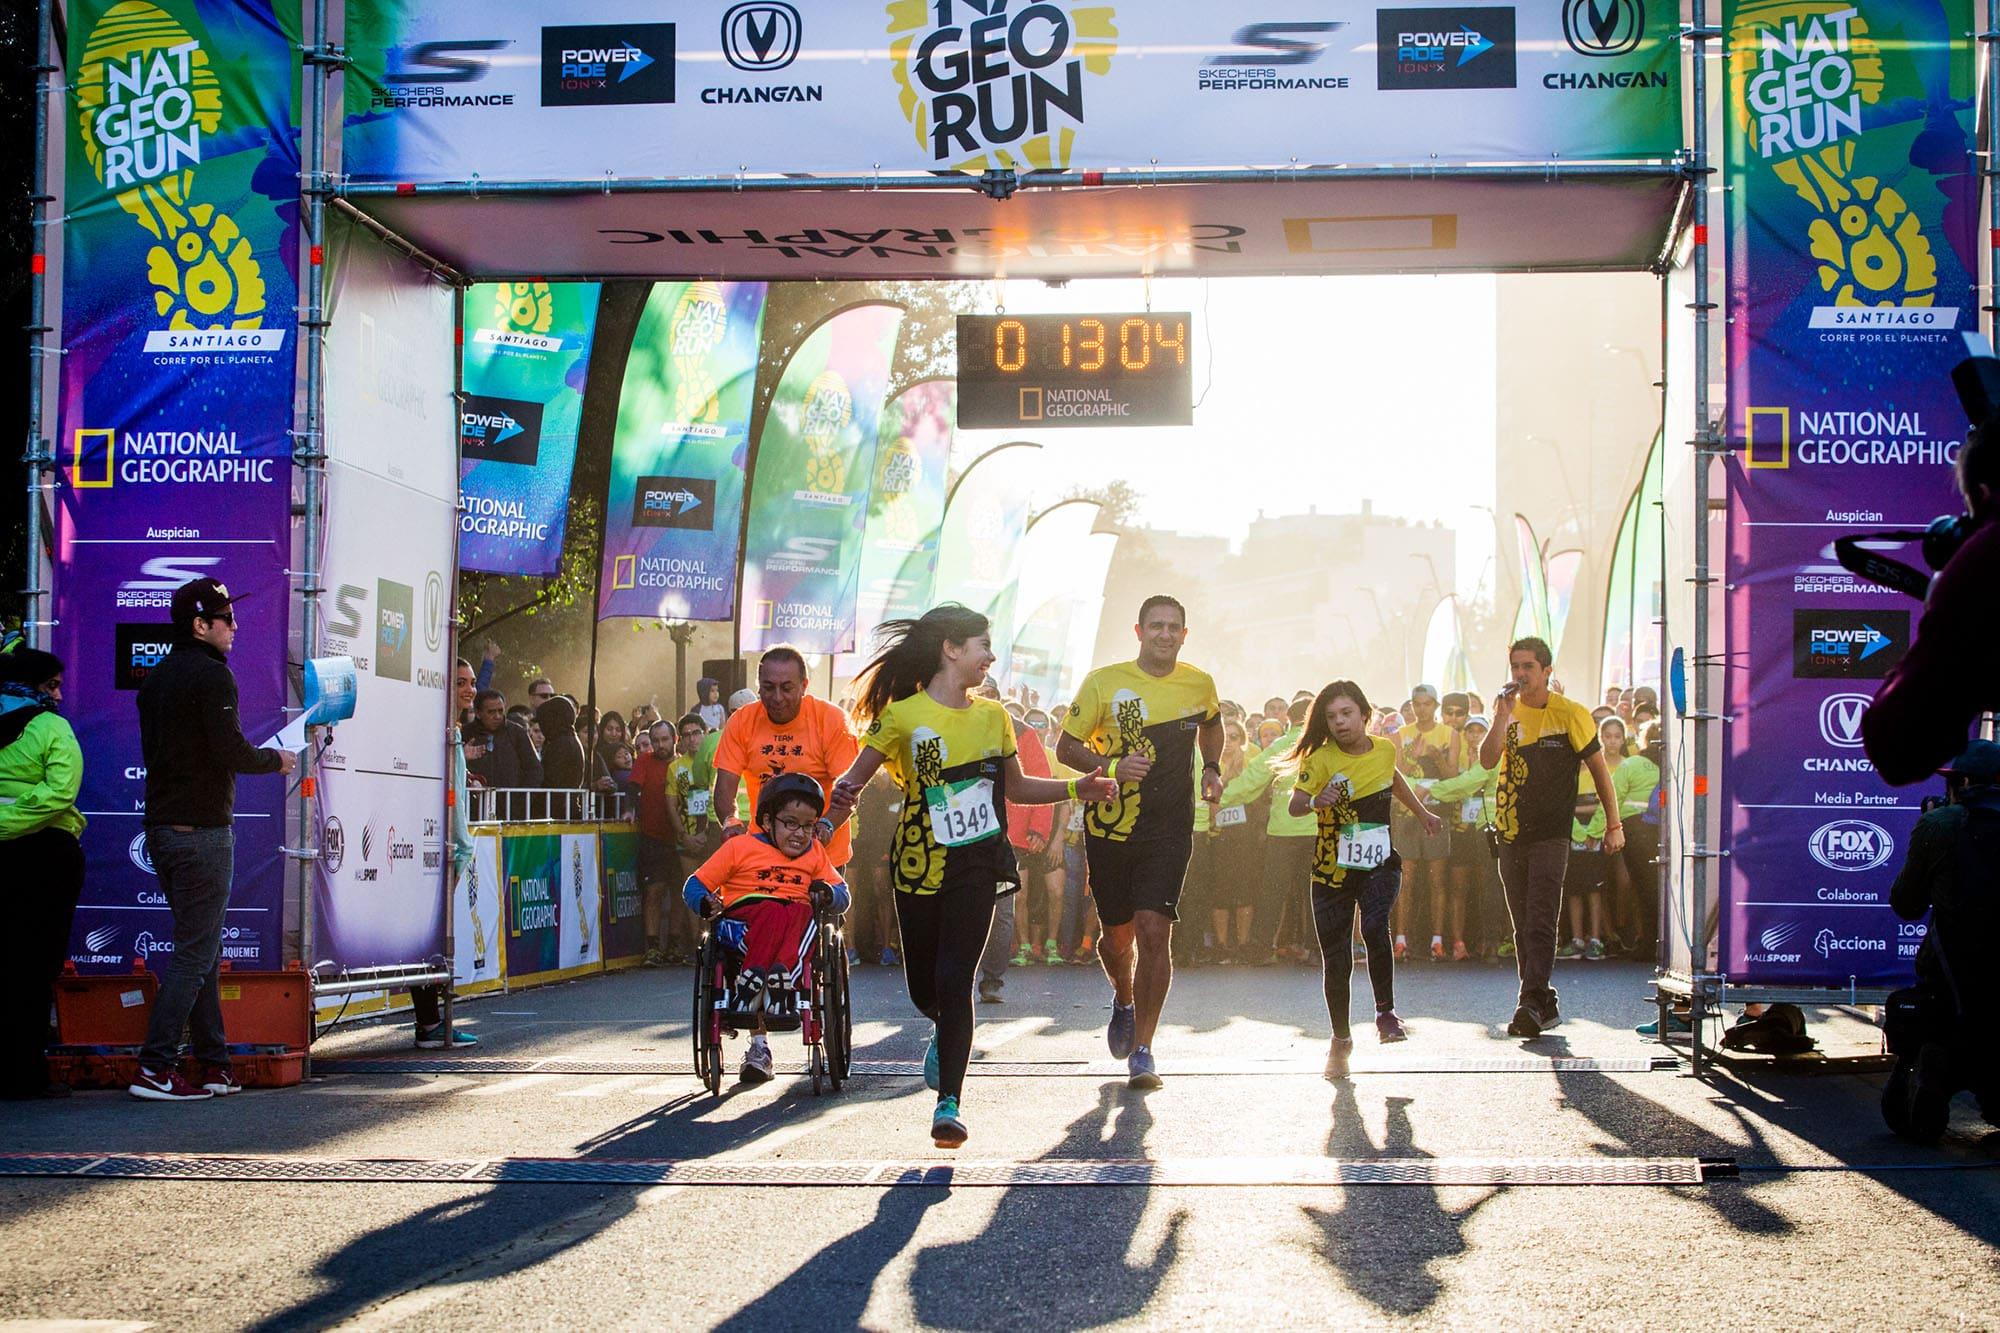 Todo listo para Nat Geo Run 2019